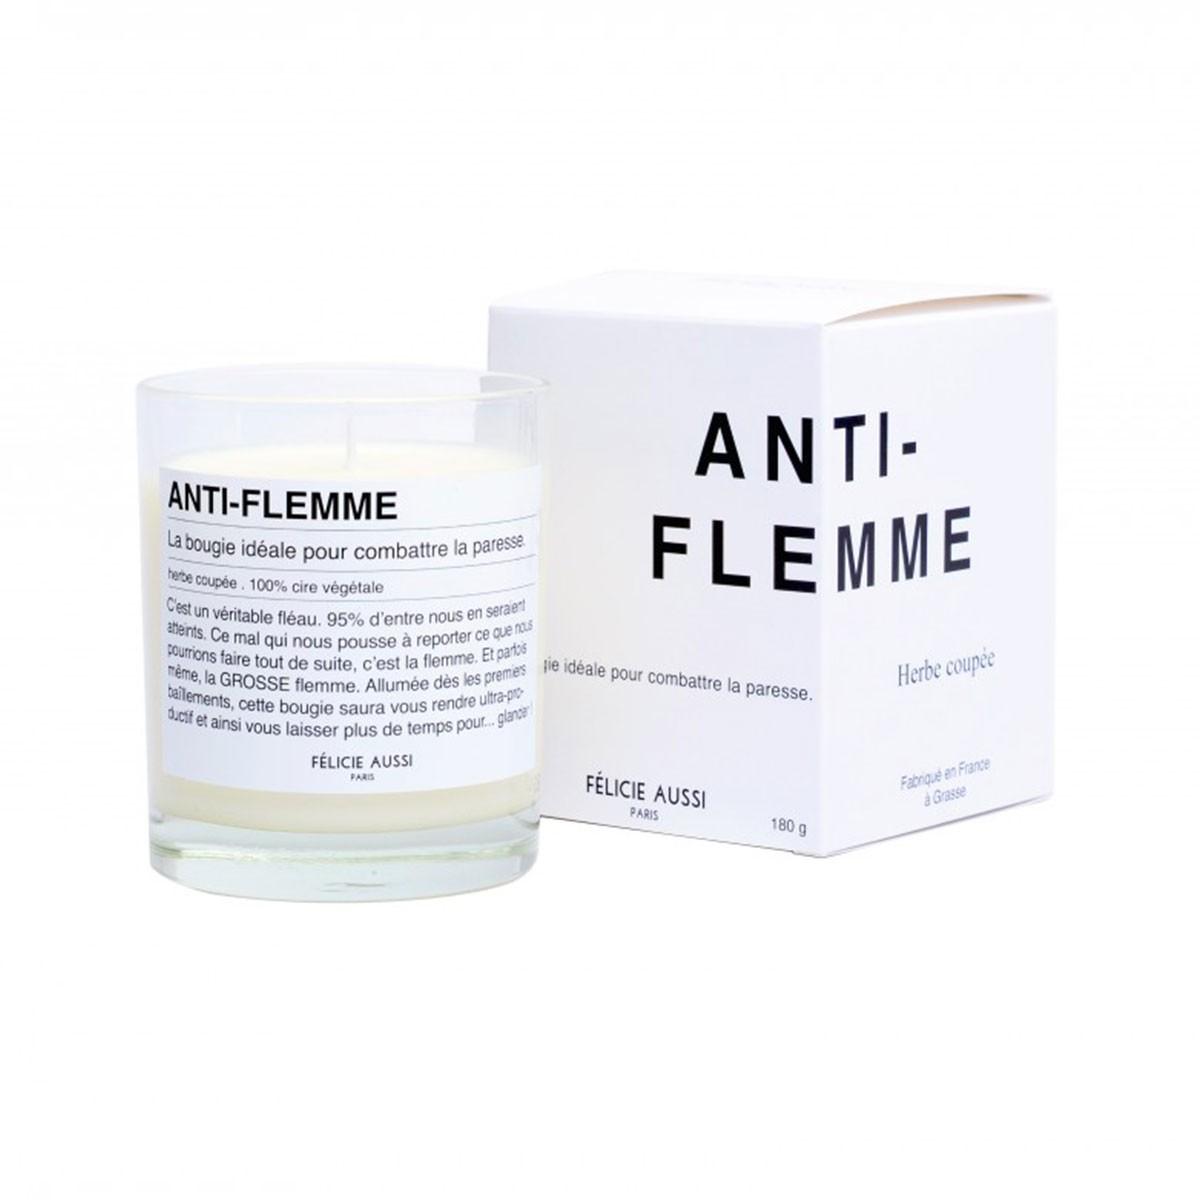 Bougie ANTI-FLEMME